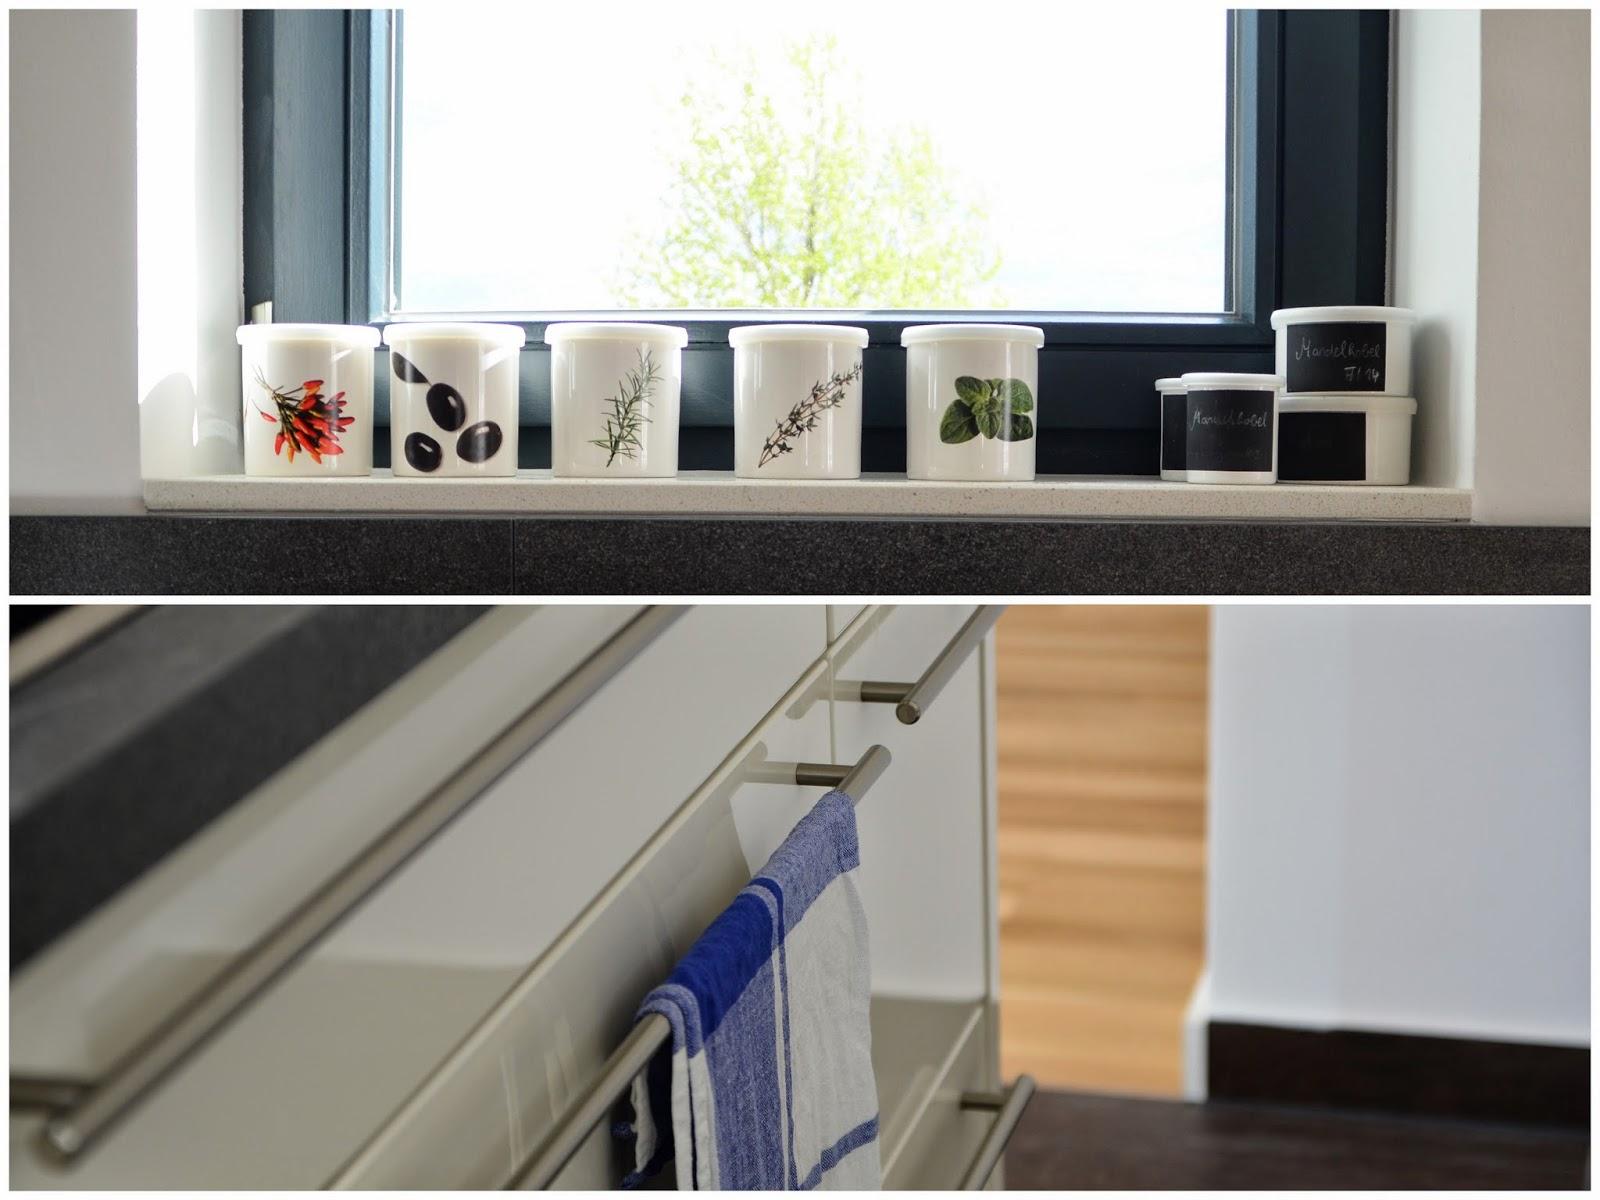 wollgespinst k chenliebe. Black Bedroom Furniture Sets. Home Design Ideas